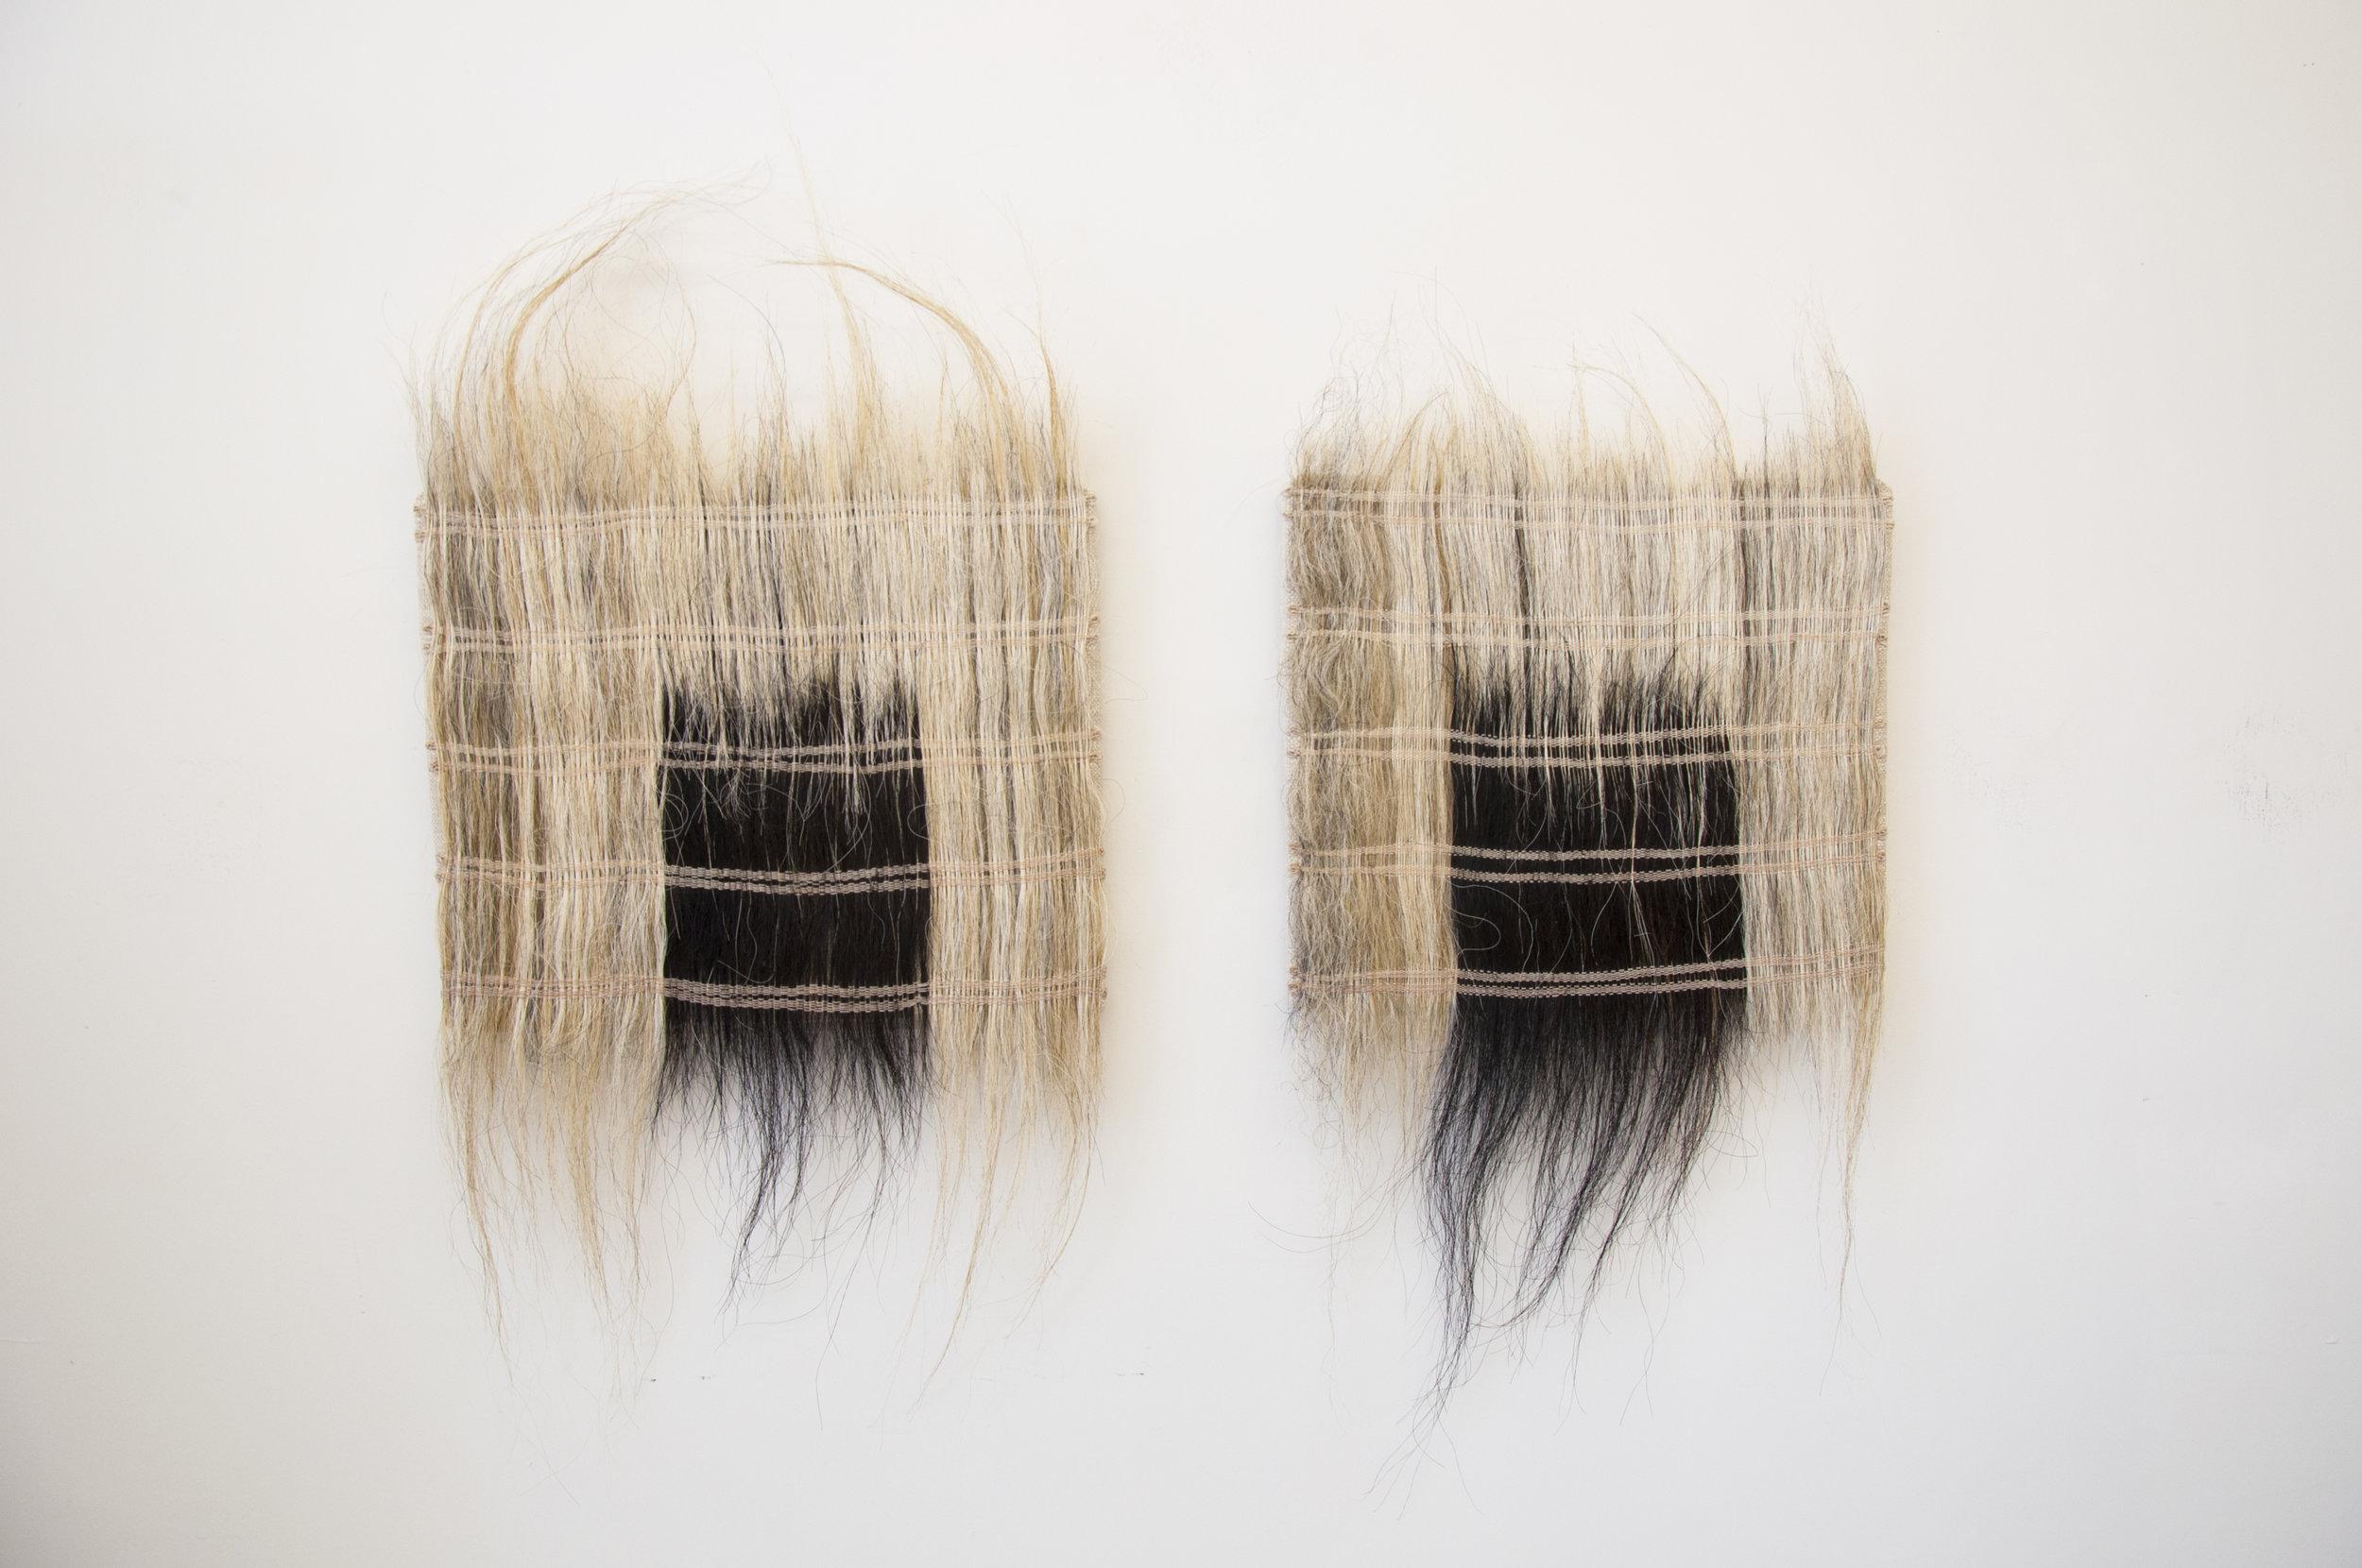 Catherine Fairbanks / Two Chimneys